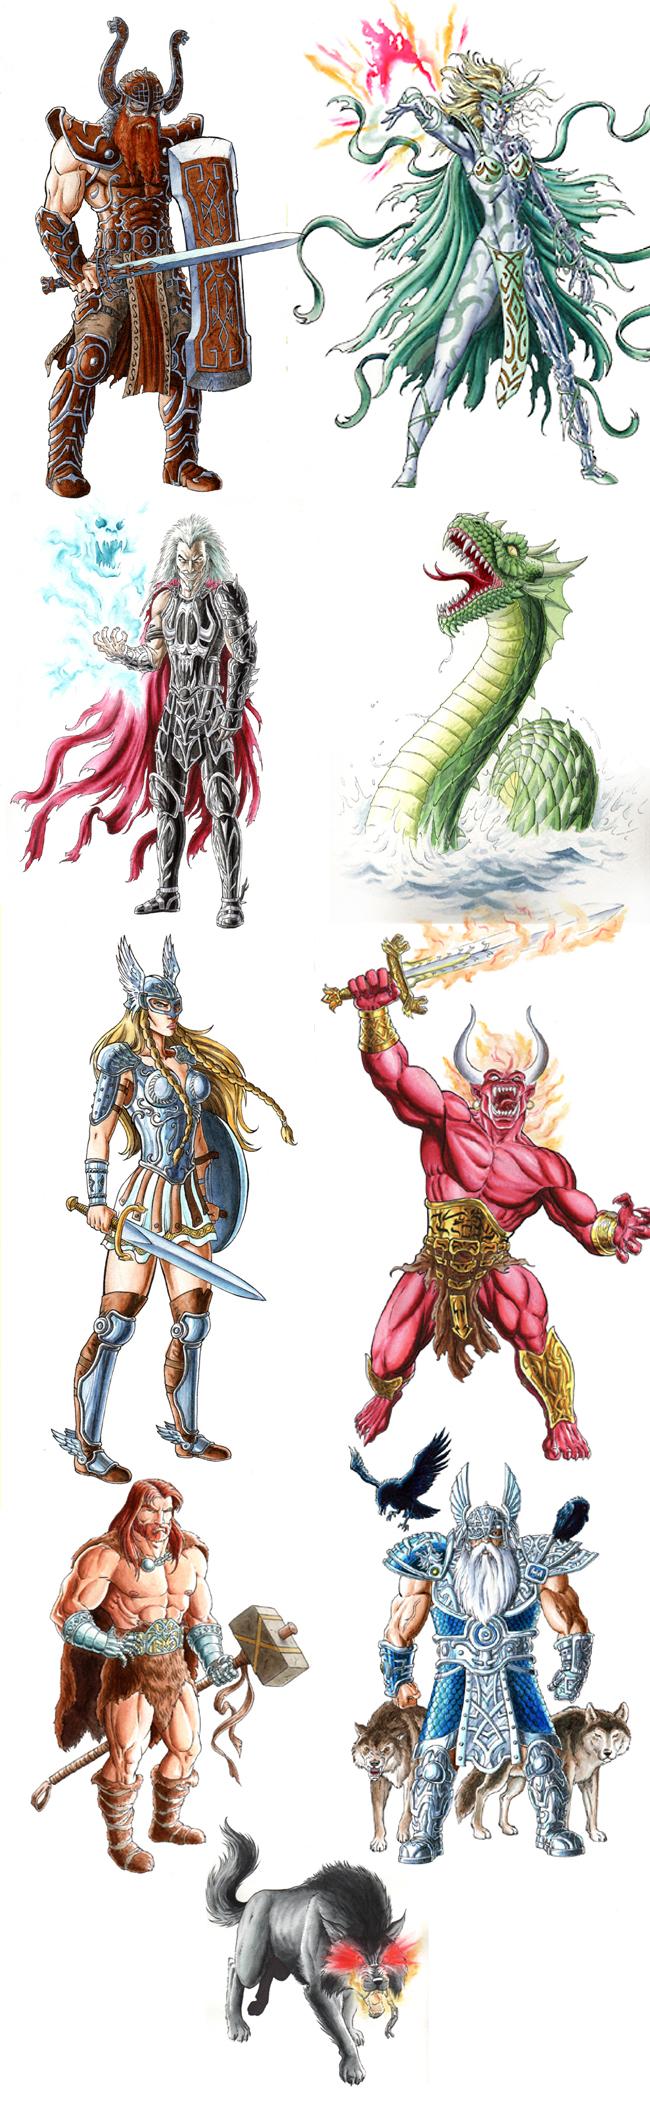 Personajes de Mariano Saura